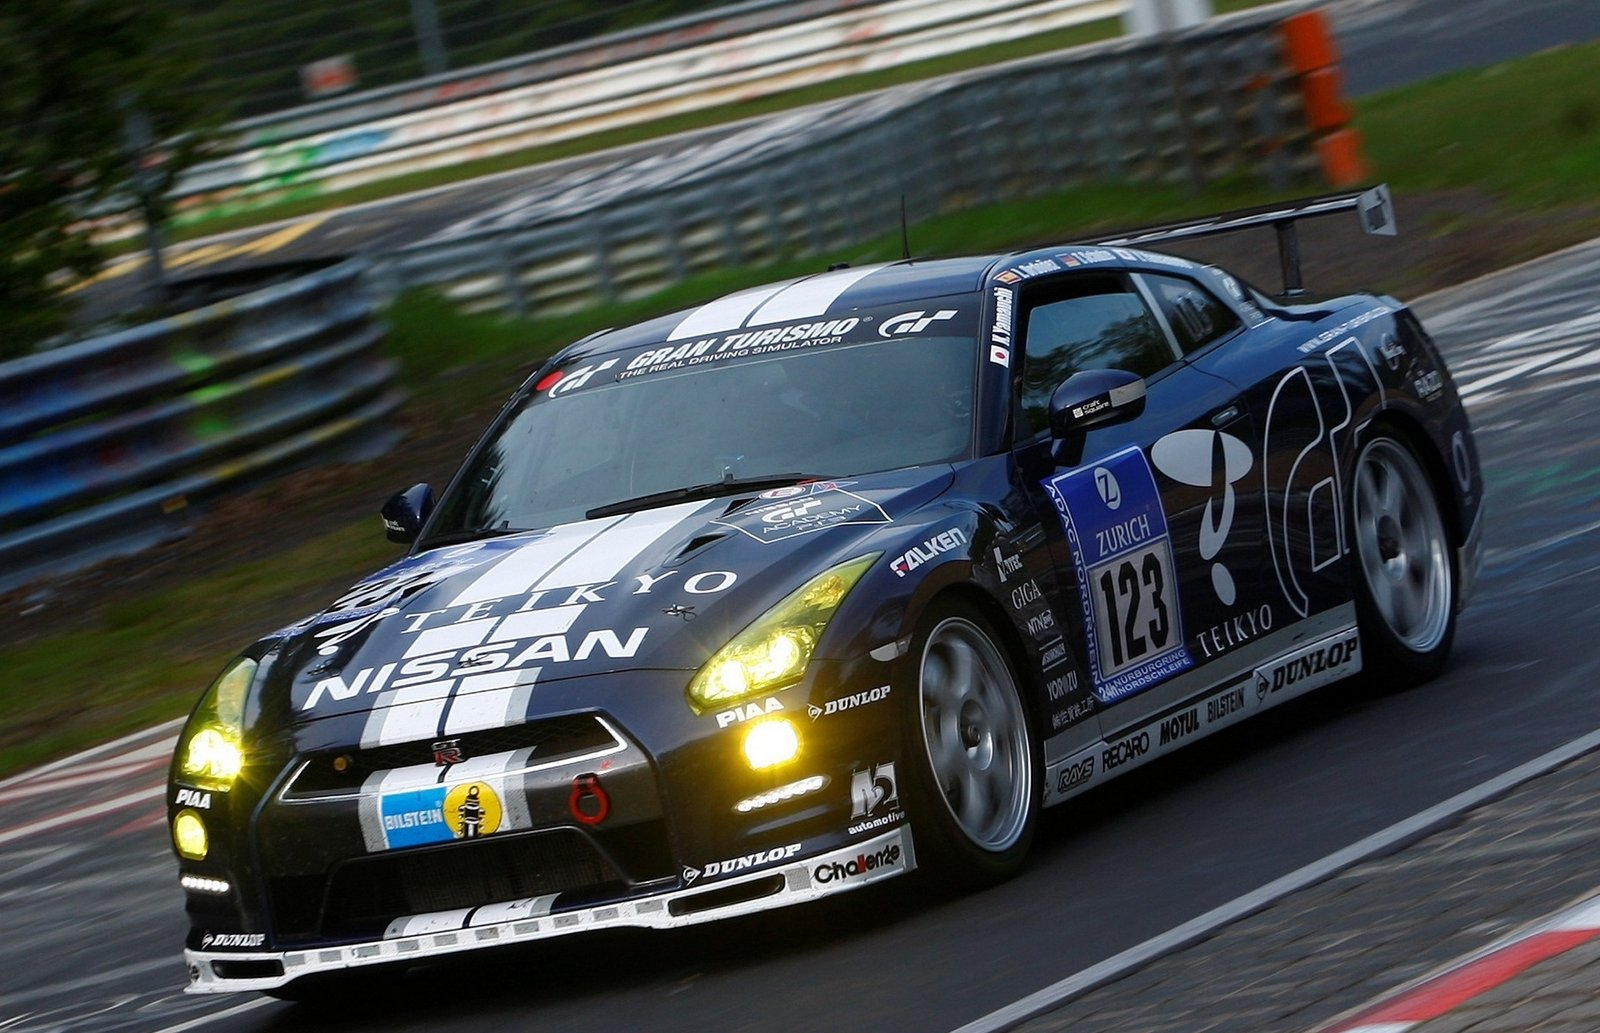 race cars top speed